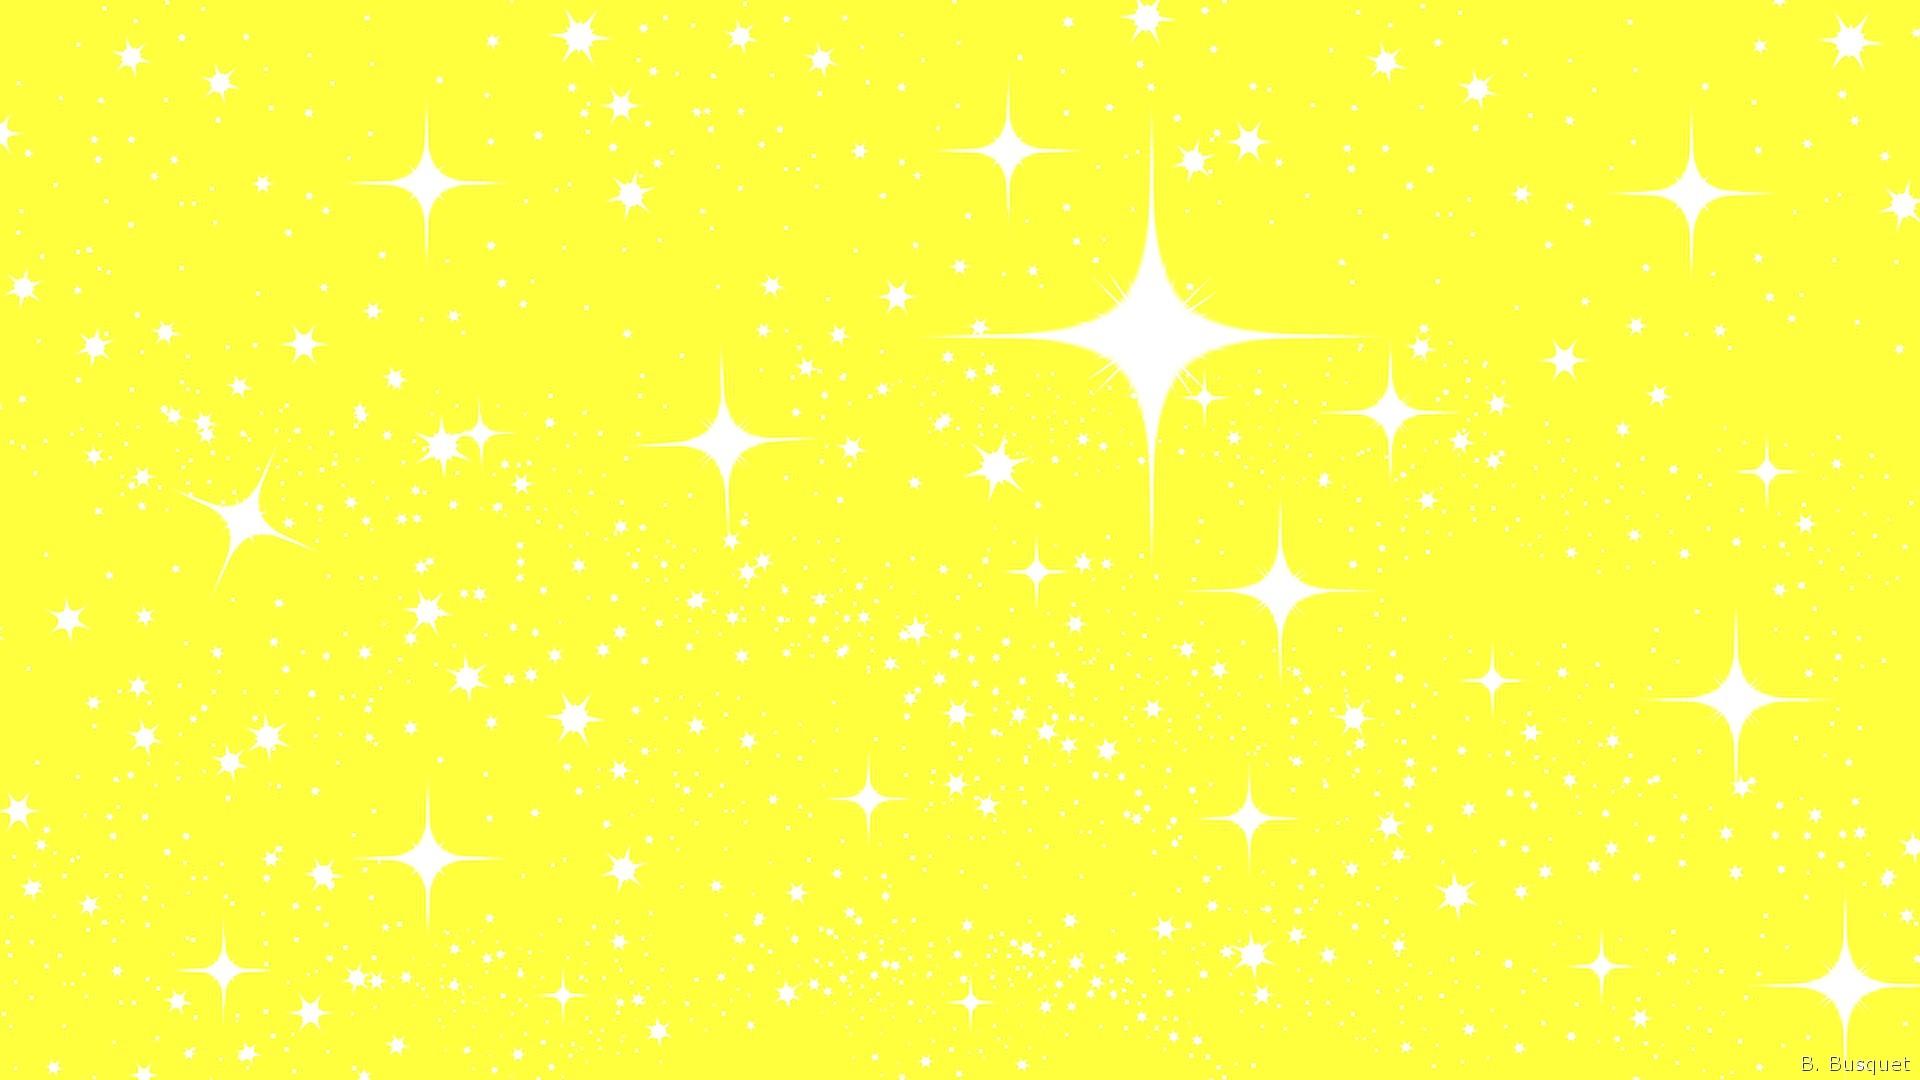 2560x1440 Bright Yellow Background 1920x1200